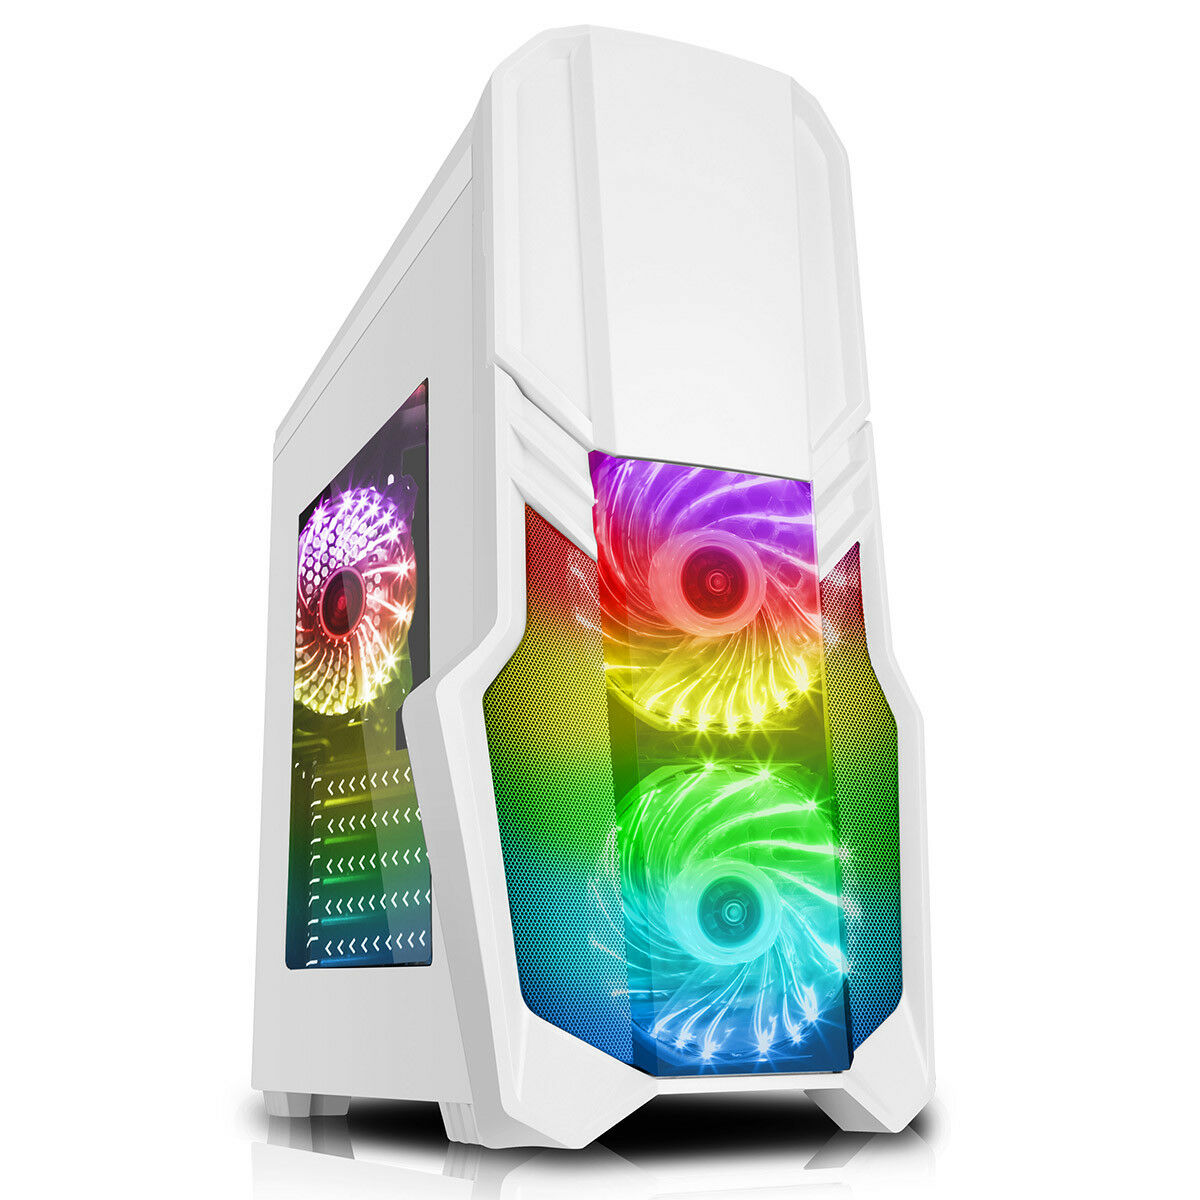 Computer Games - Gaming PC Intel Core i5 4440 Computer SSD HDD 16GB RAM GT GTX Windows 10 WiFi